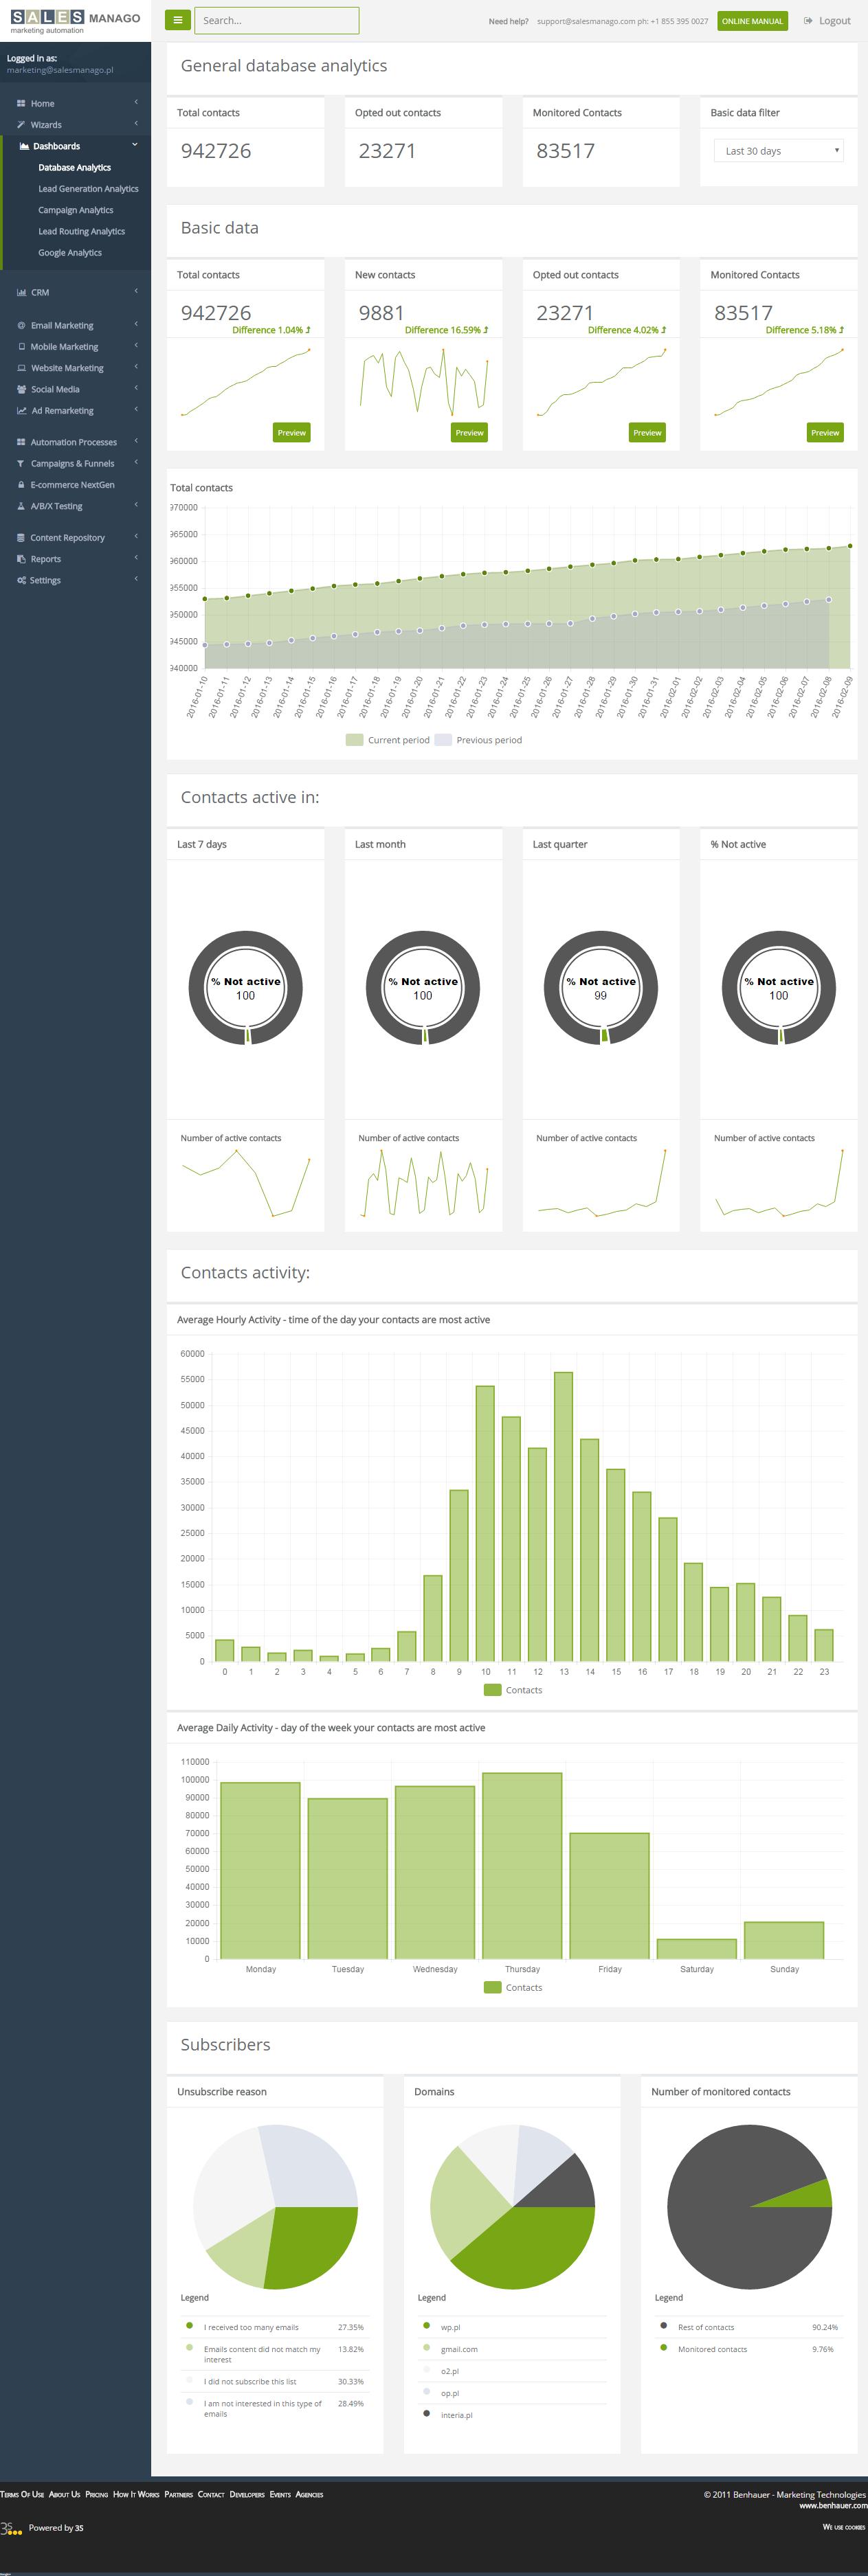 General Database Analytics